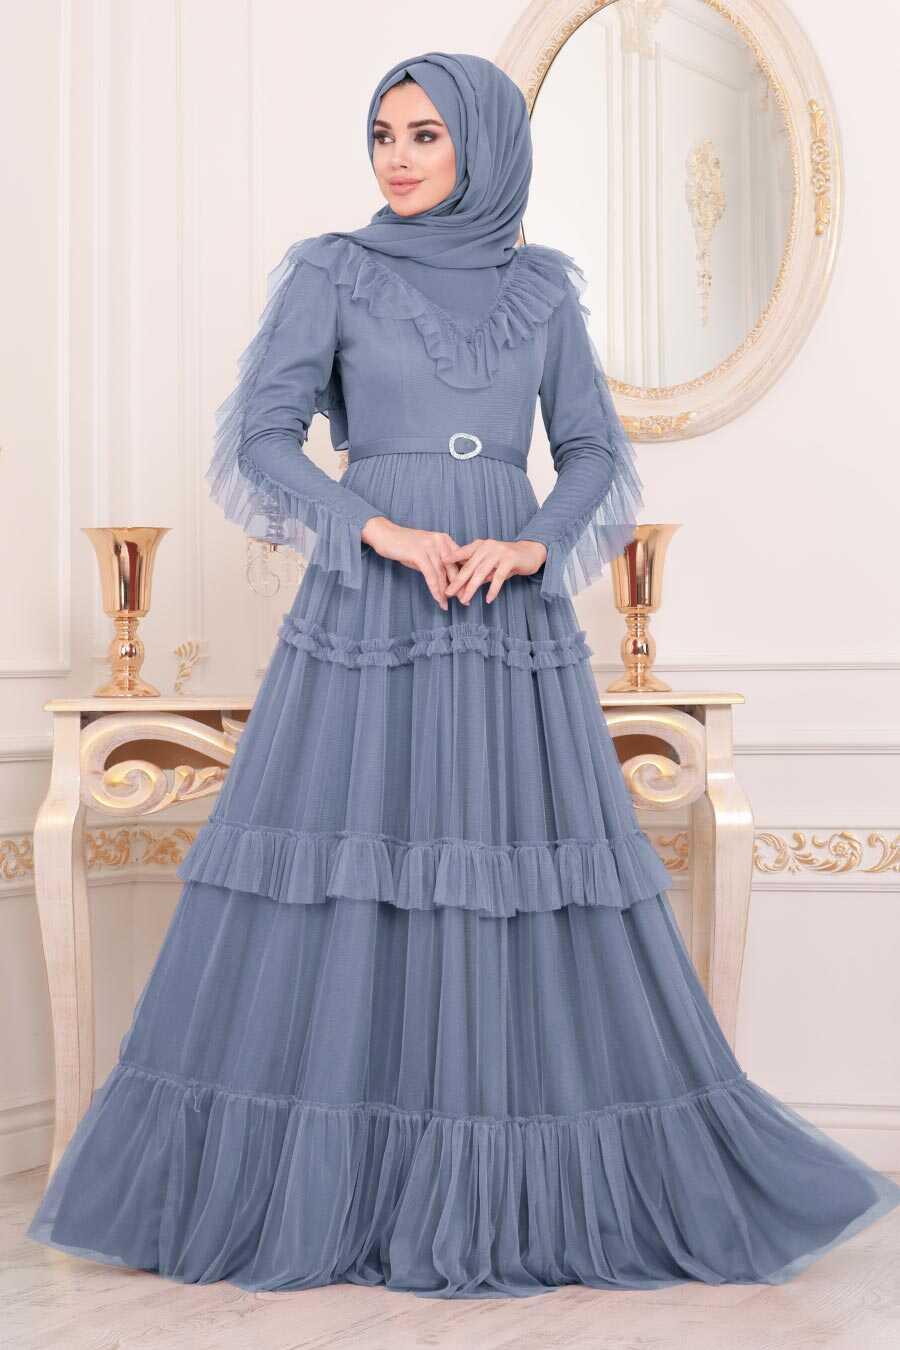 İndigo Blue Hijab Evening Dress 4097IM